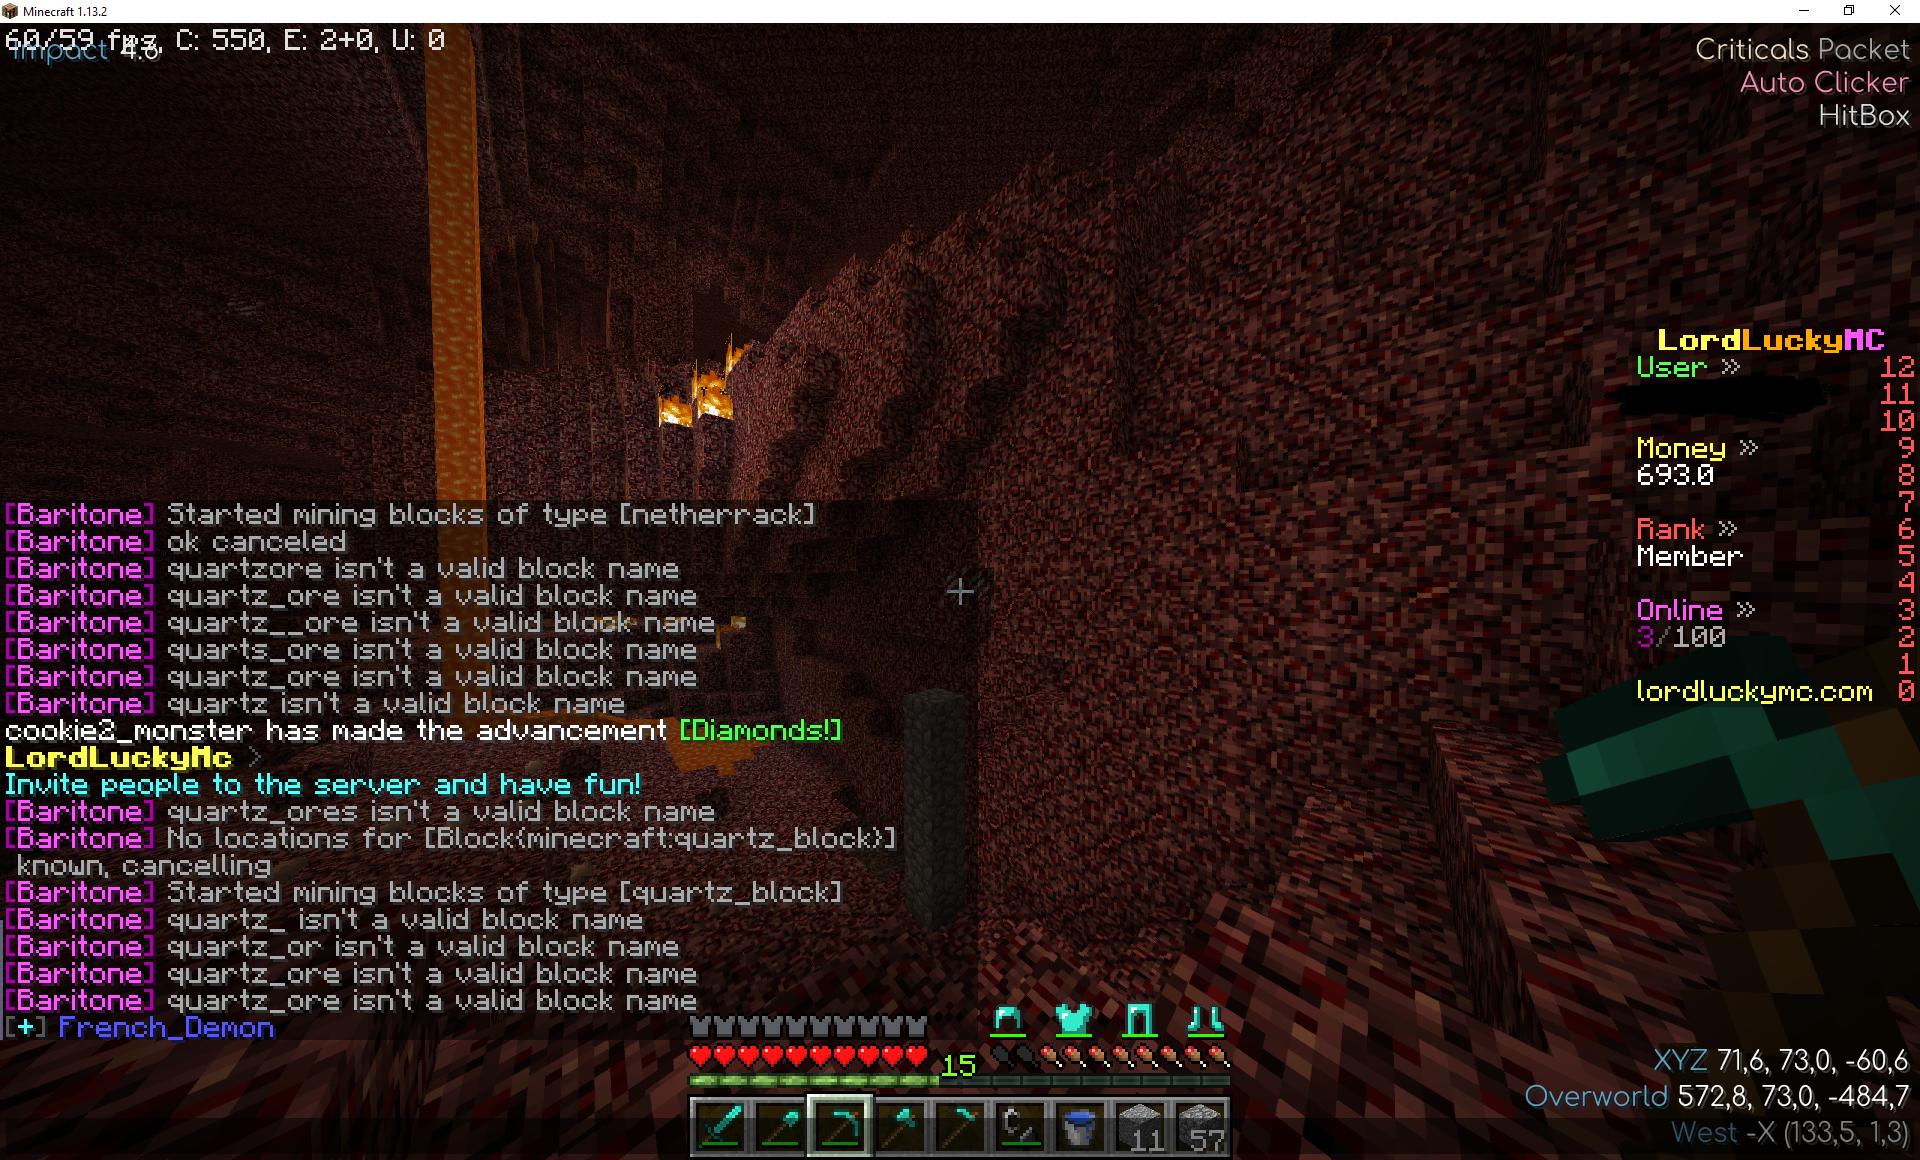 quartz_ore isn't a valid block name · Issue #483 · cabaletta